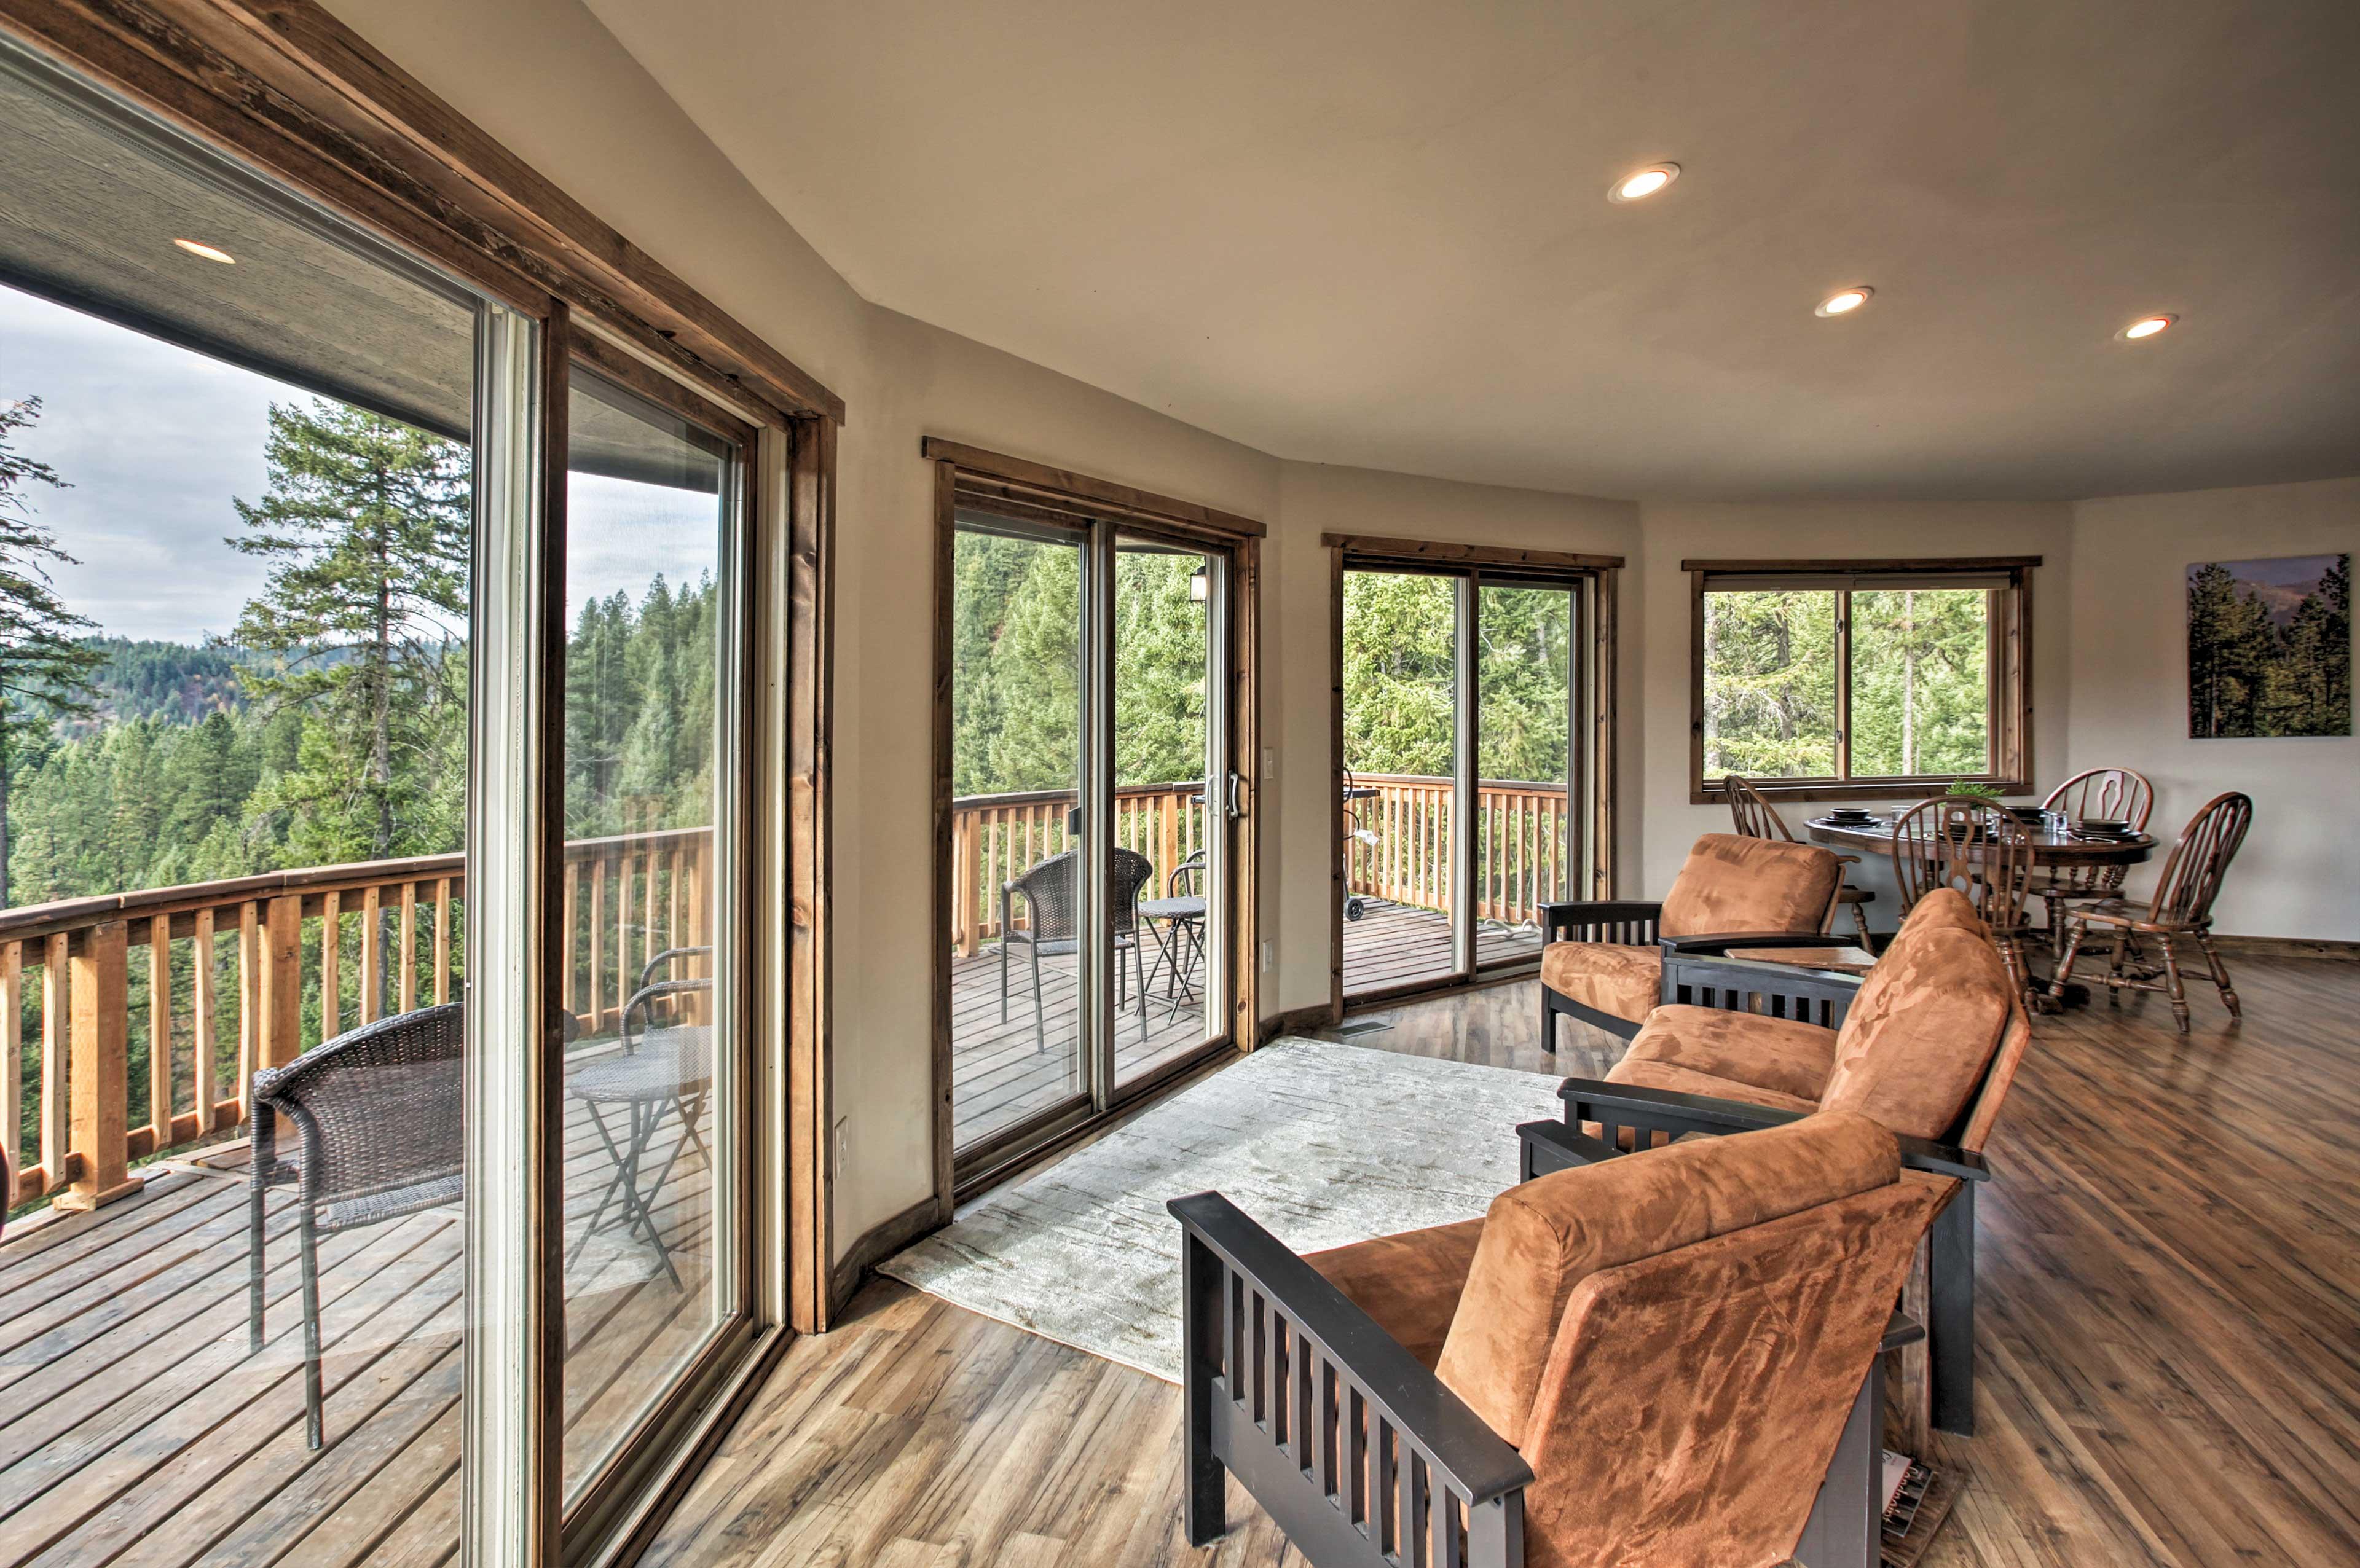 Enjoy amazing wooded views through the 3 sliding glass doors!